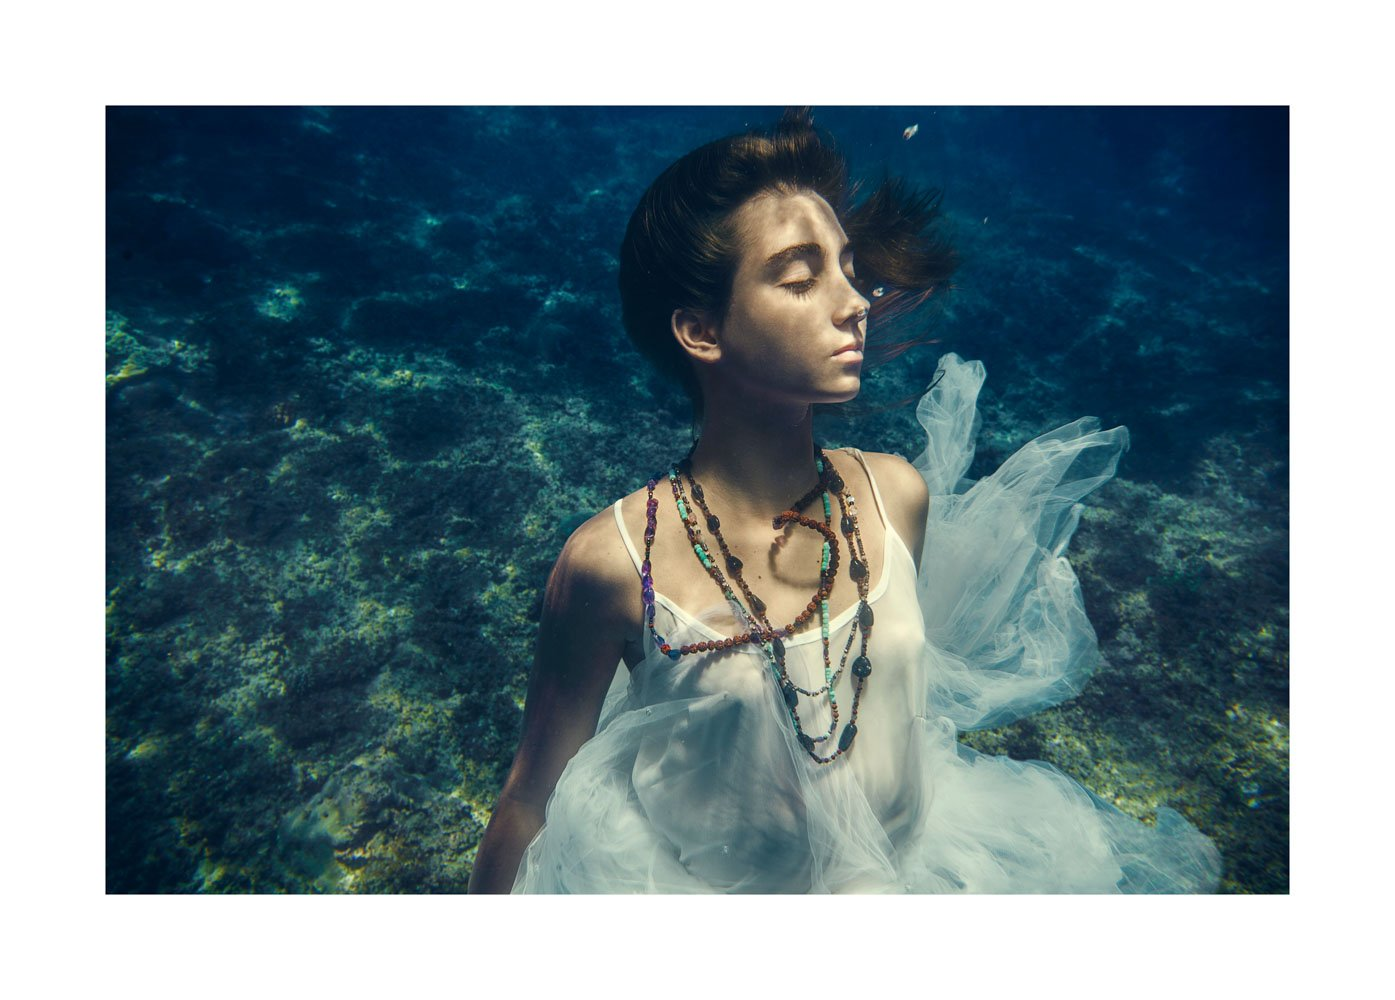 the_forest_magazine_amberly-valentine_alessia-marietti_angie-angorro_0007